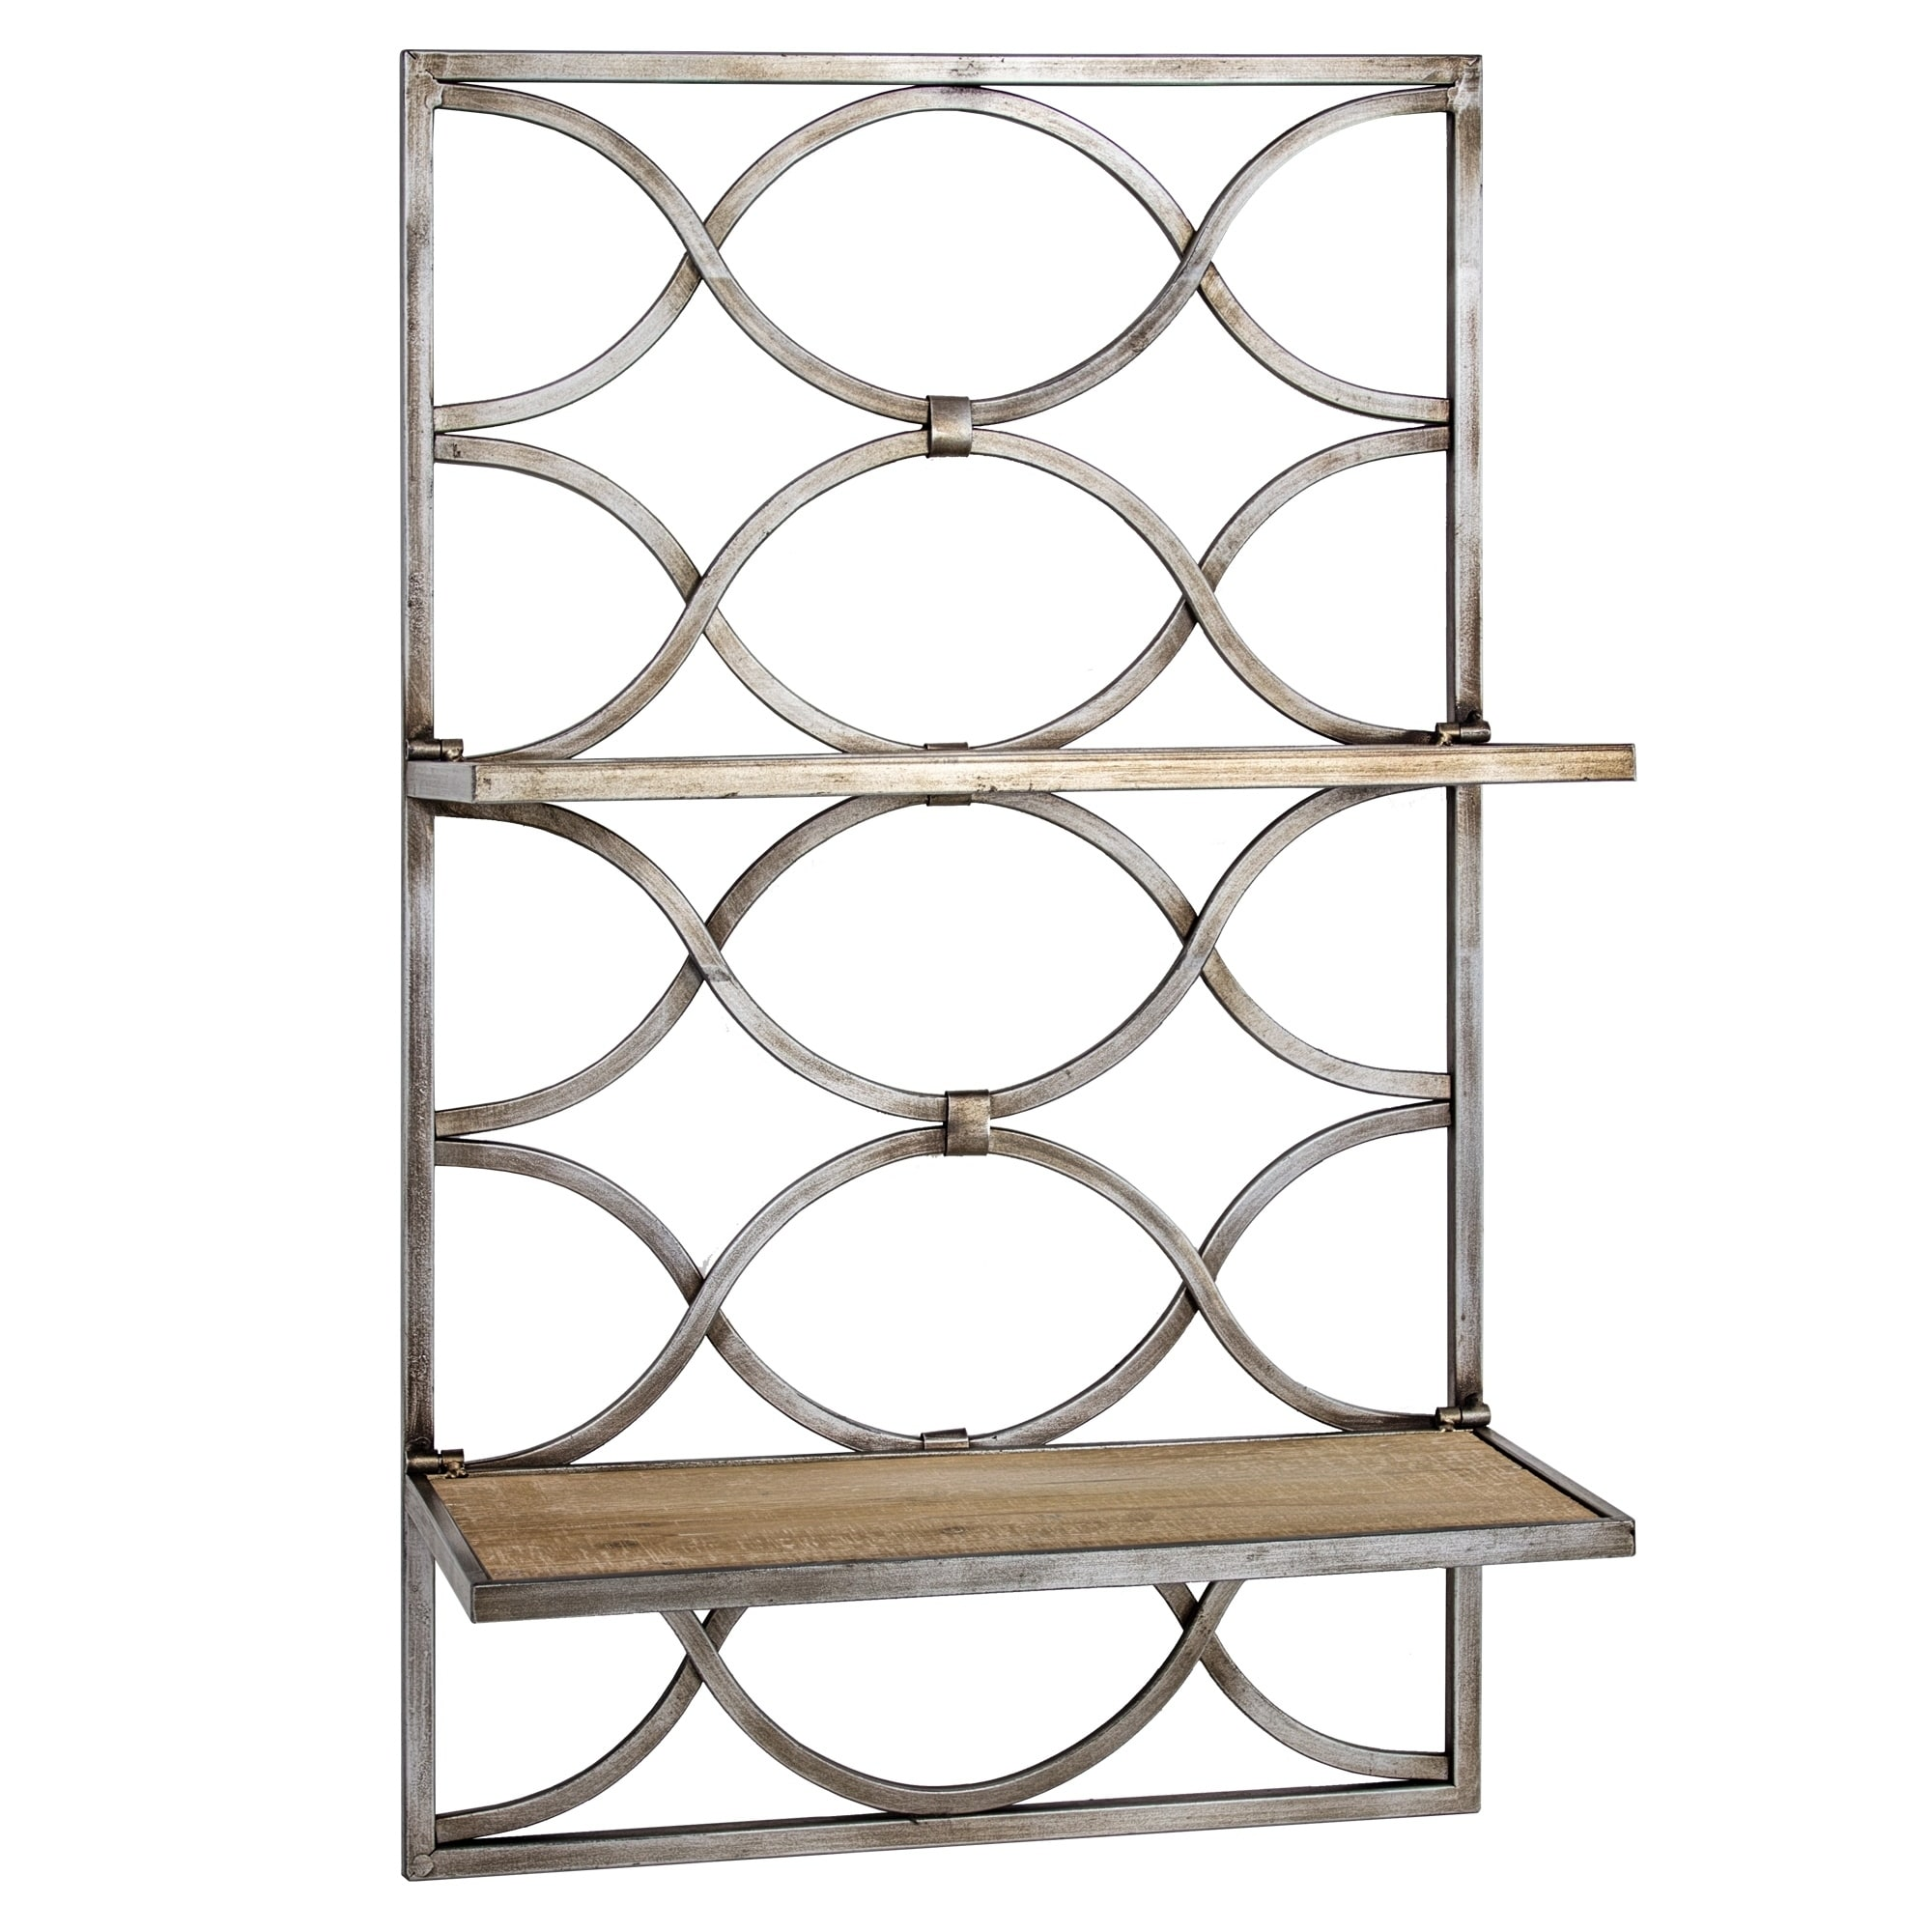 American Art Decor Wood And Metal Hanging Shelves Rack